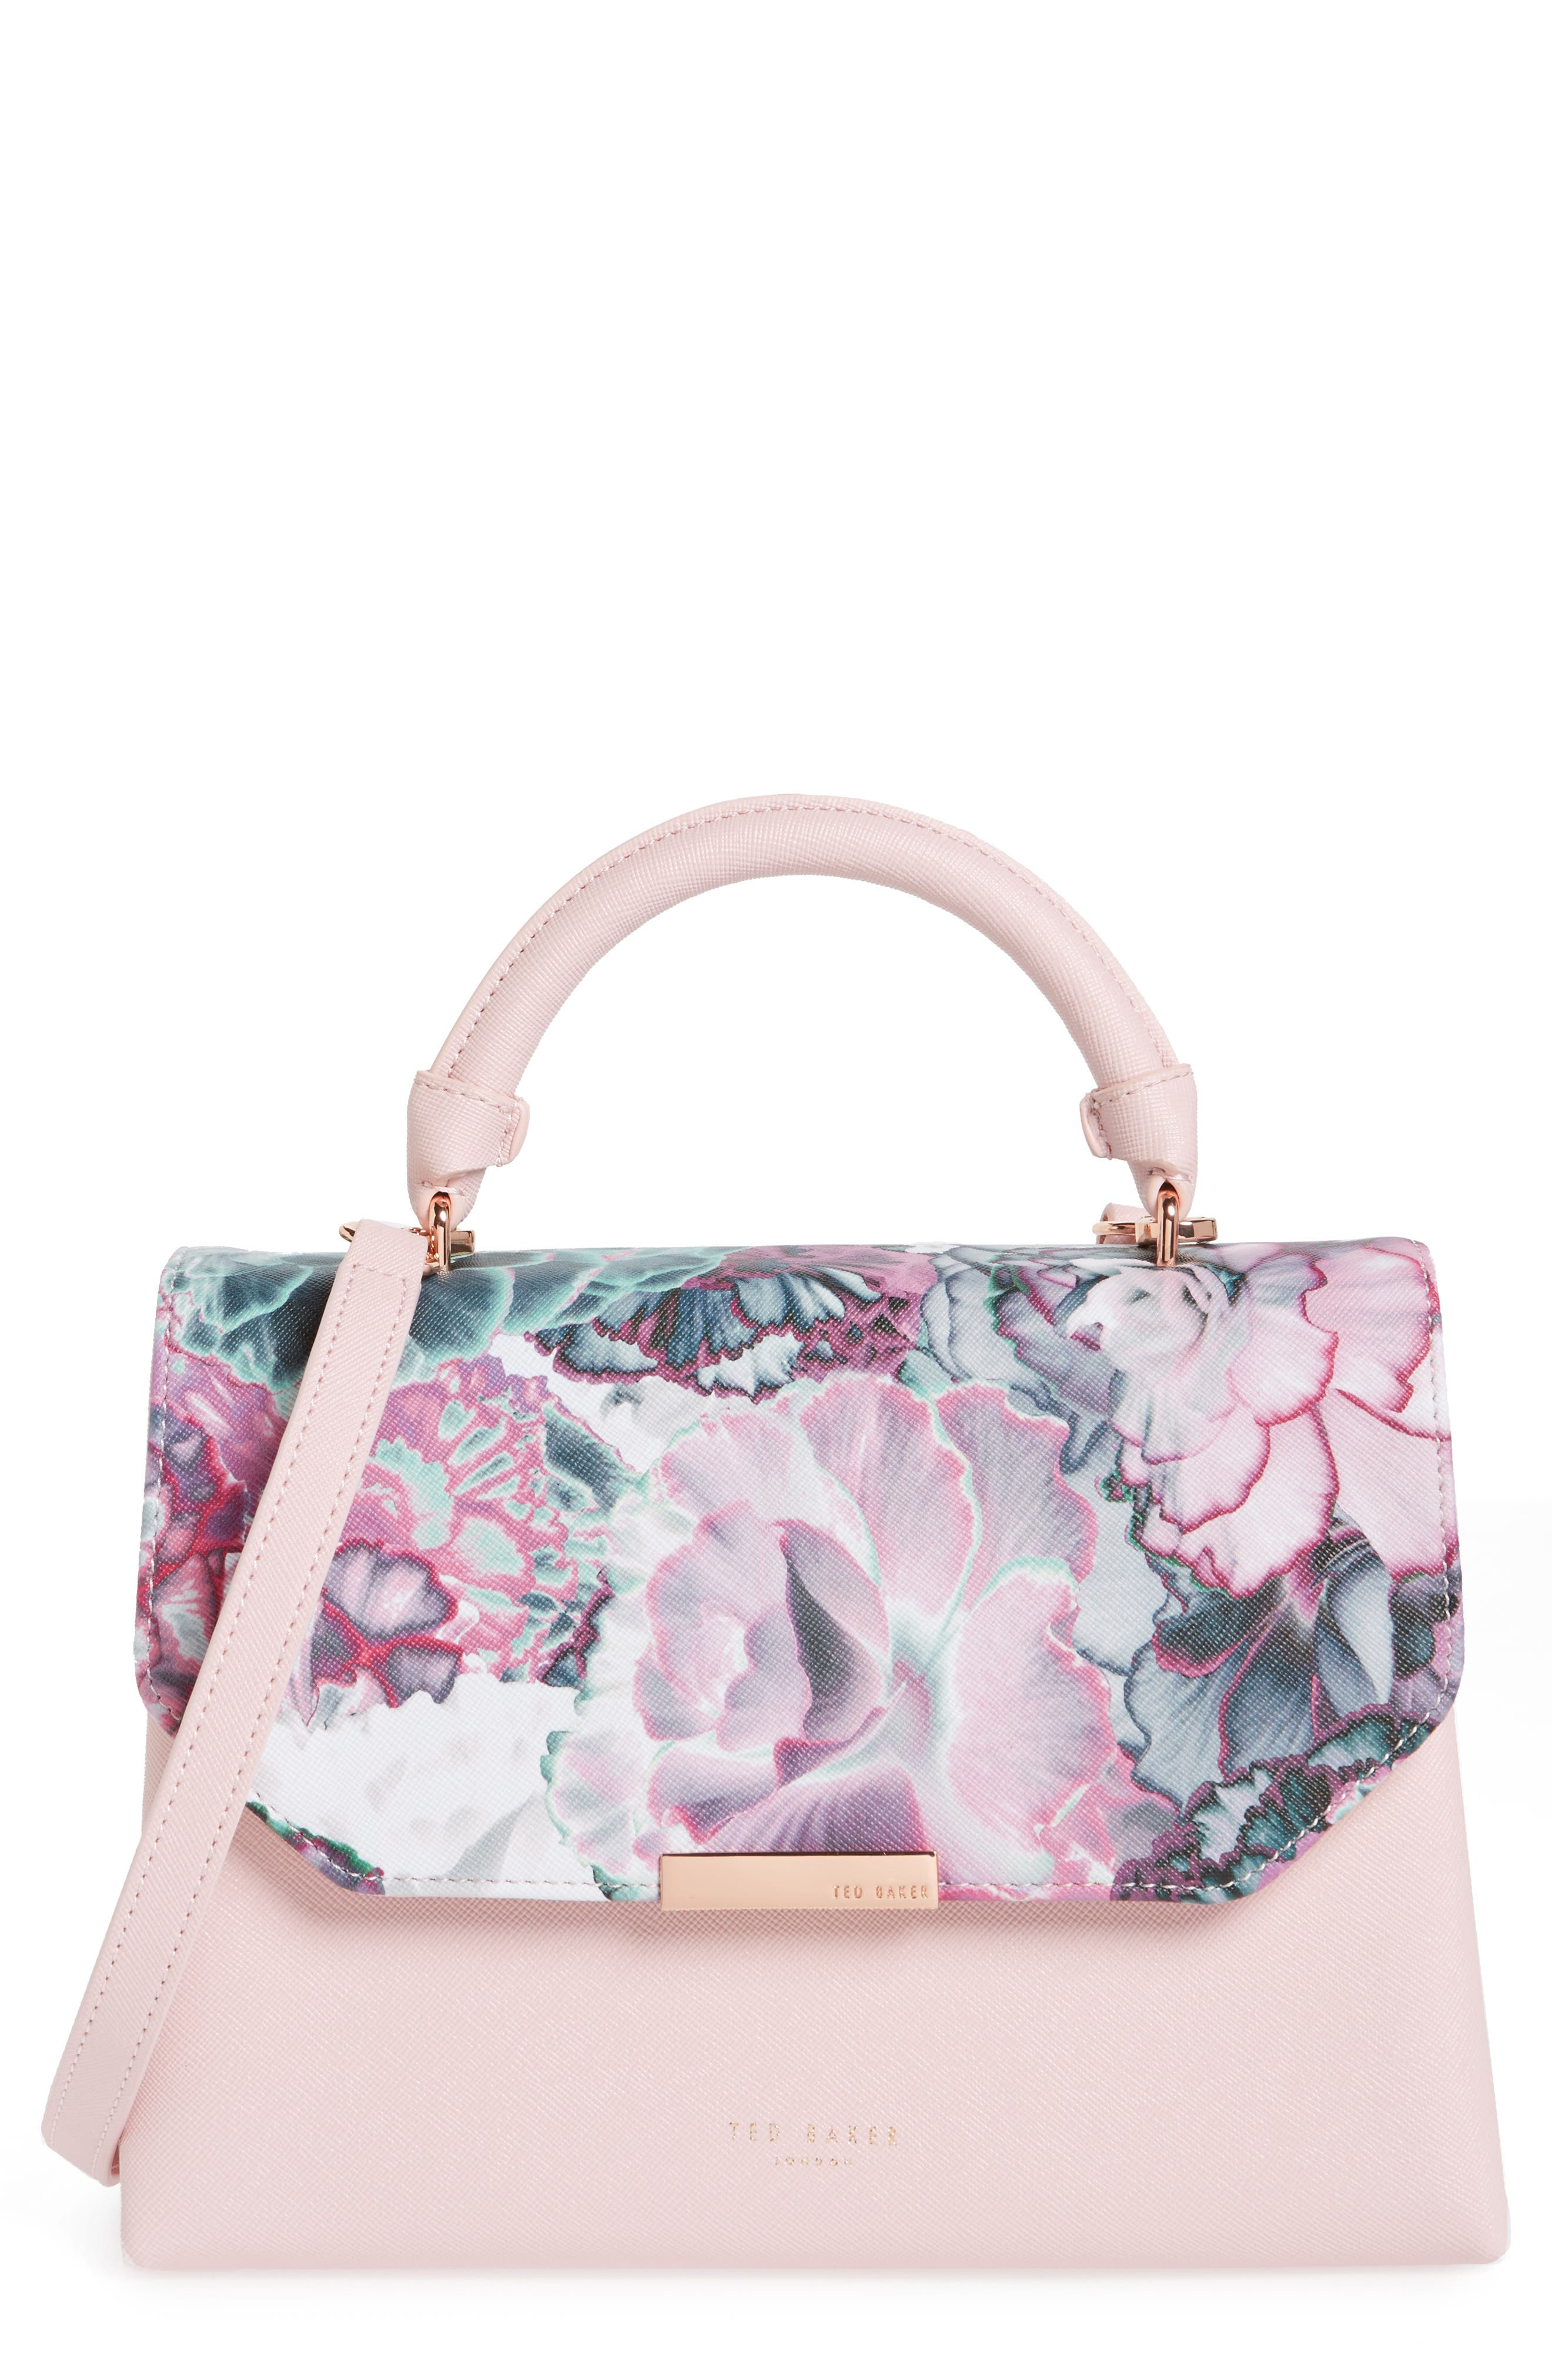 Alternate Image 1 Selected - Ted Baker London Illuminated Bloom Crossbody Bag